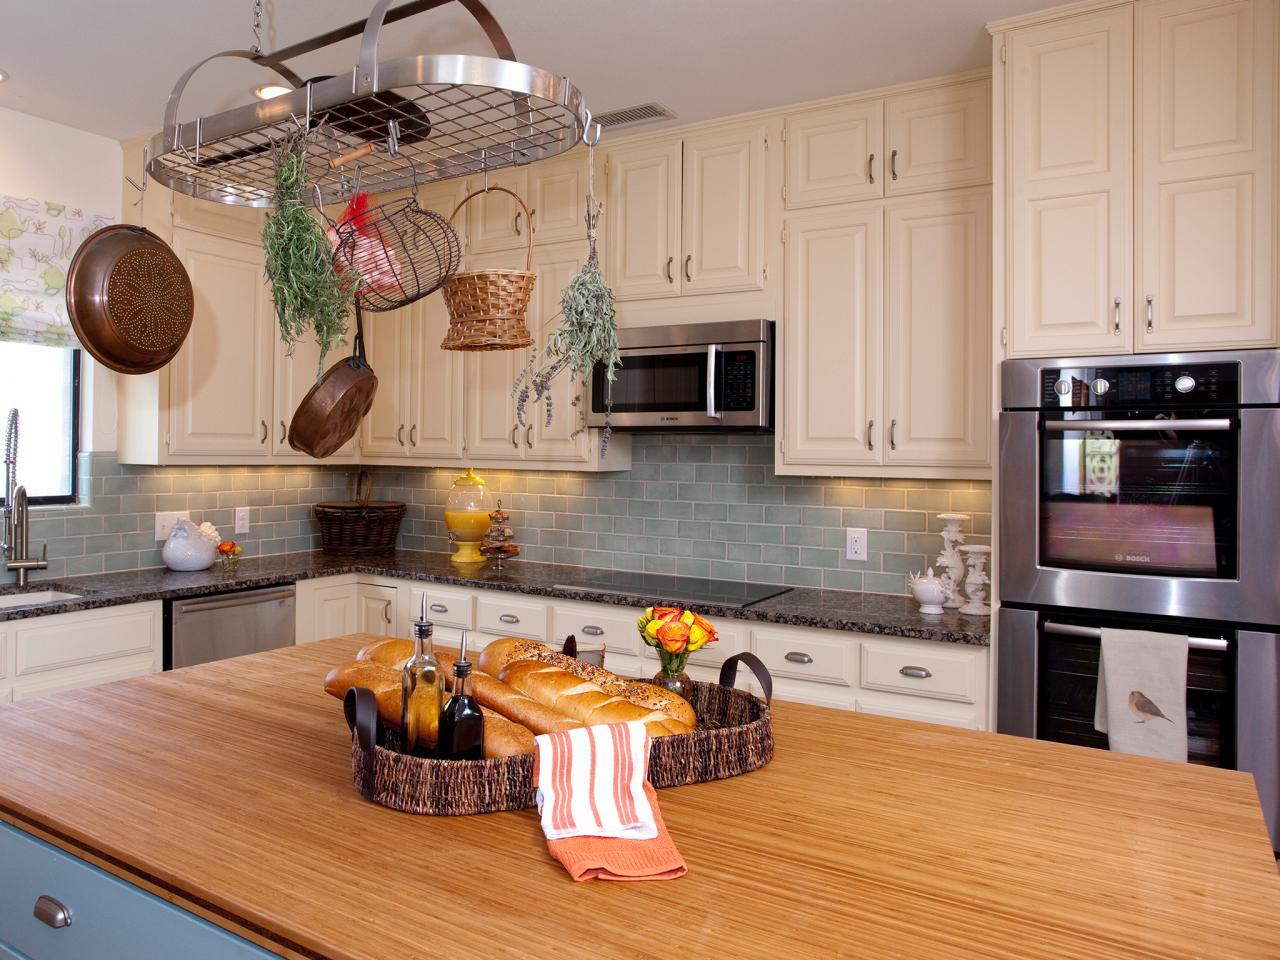 kitchen 25.jpeg